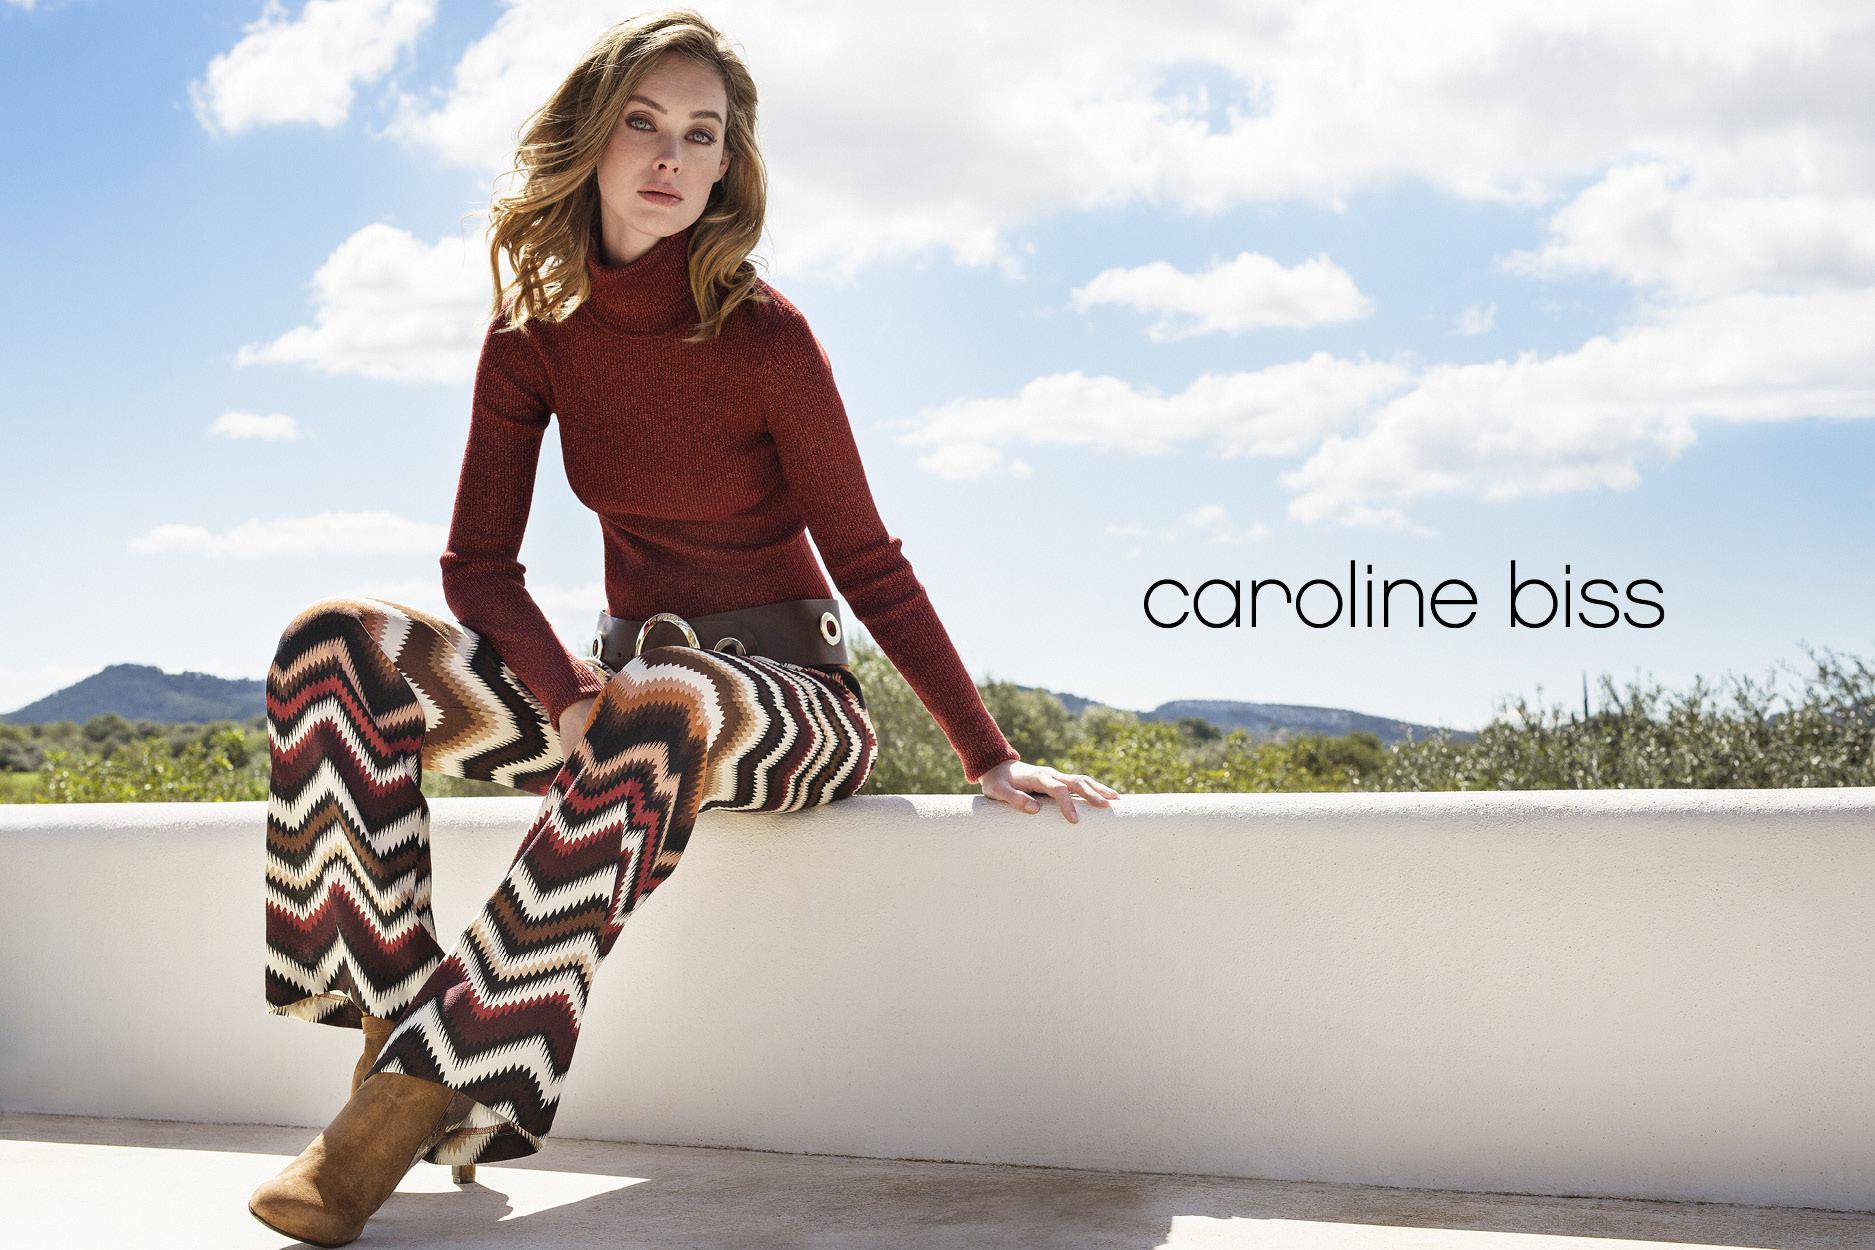 CarolineBiss_Elise van tzand_imageboulevard